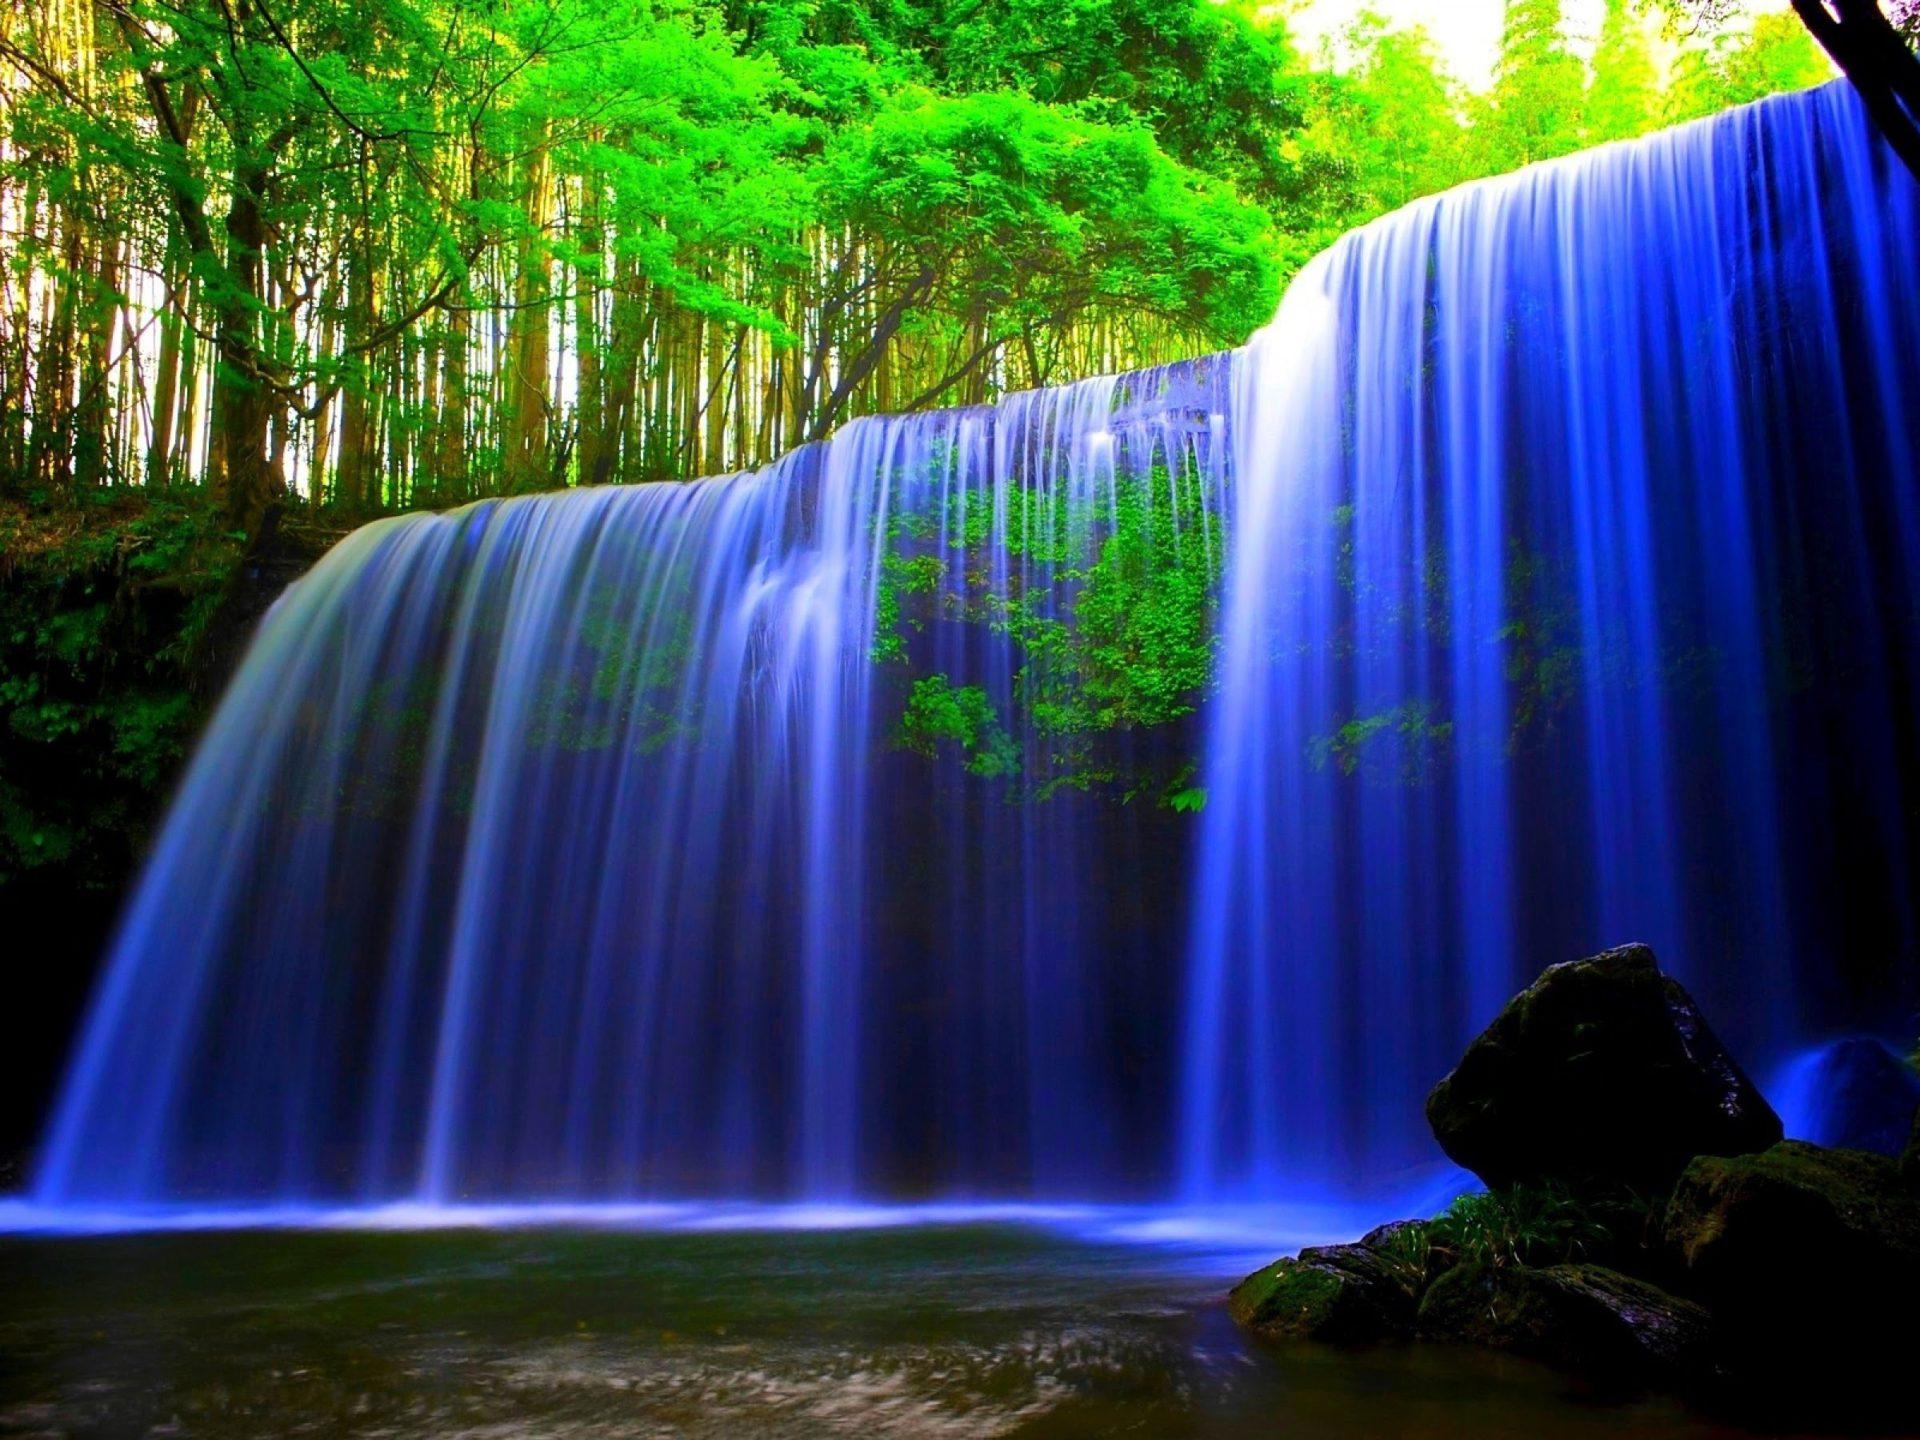 Fall Laptop Wallpaper Glowing Blue Waterfall Wallpaper Hd Wallpaper